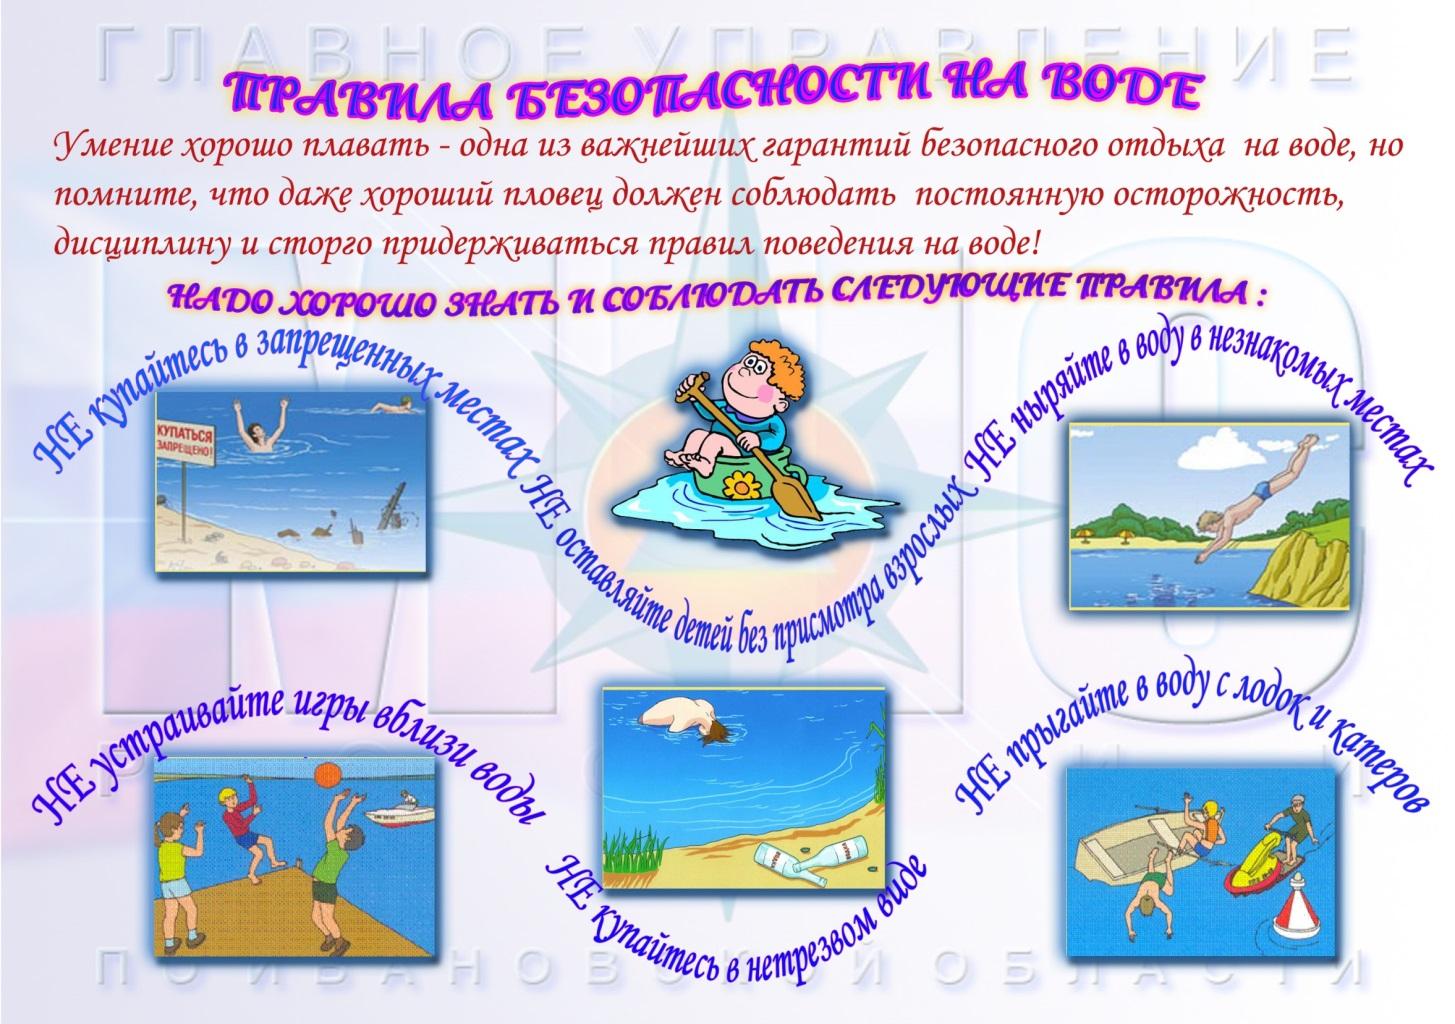 http://www.playing-field.ru/img/2015/052212/1803481